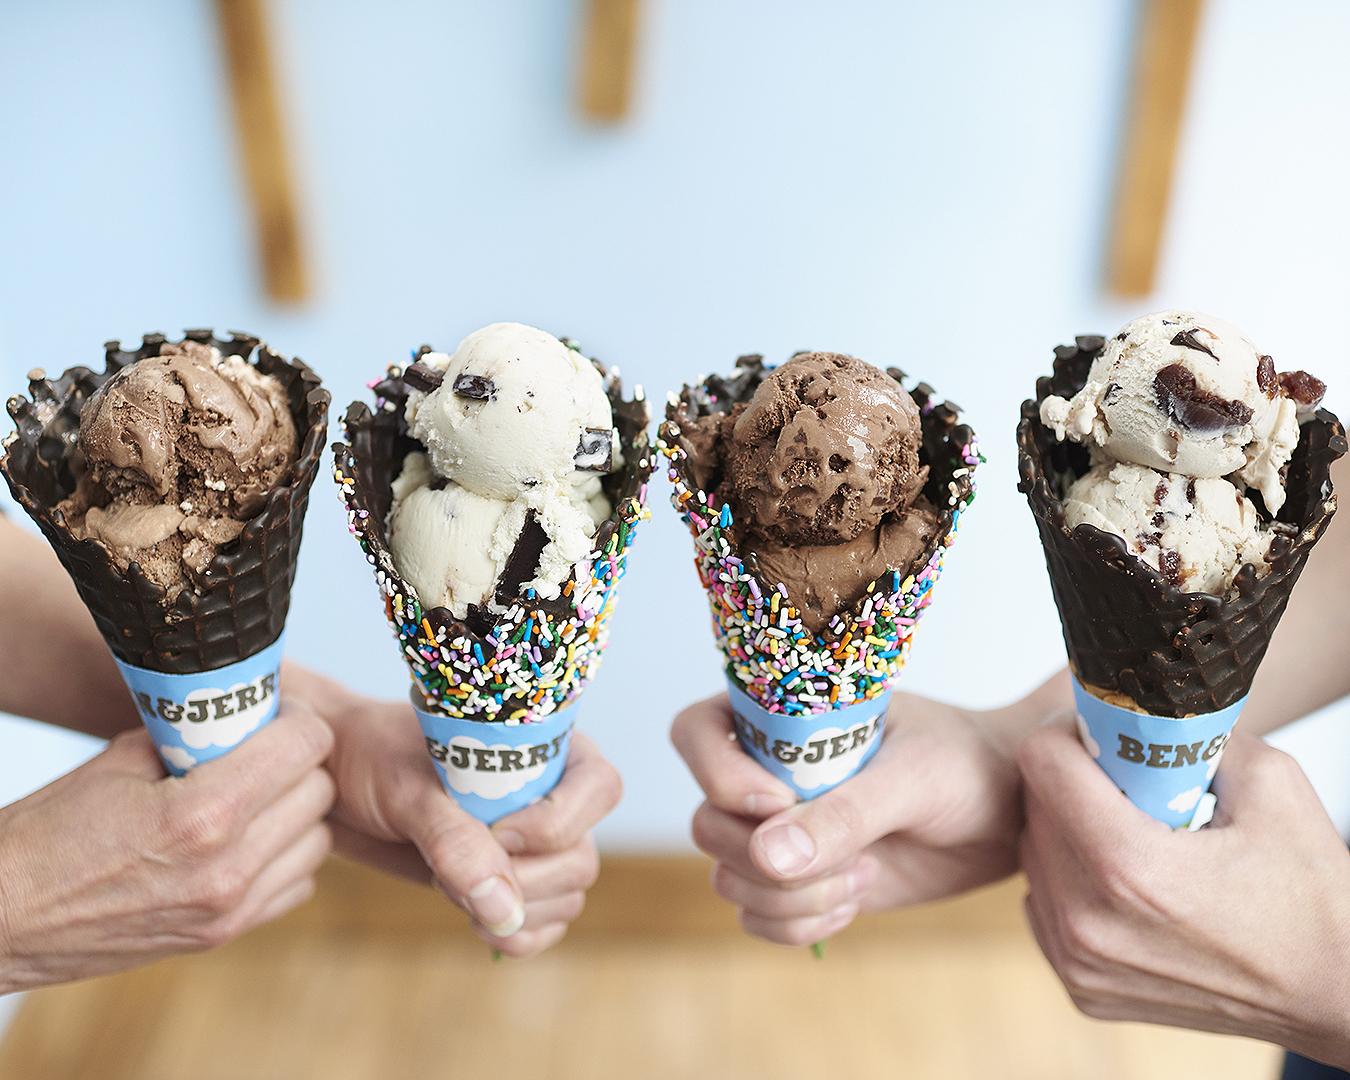 Four cones of delicious Ben & Jerry's ice cream is held aloft.